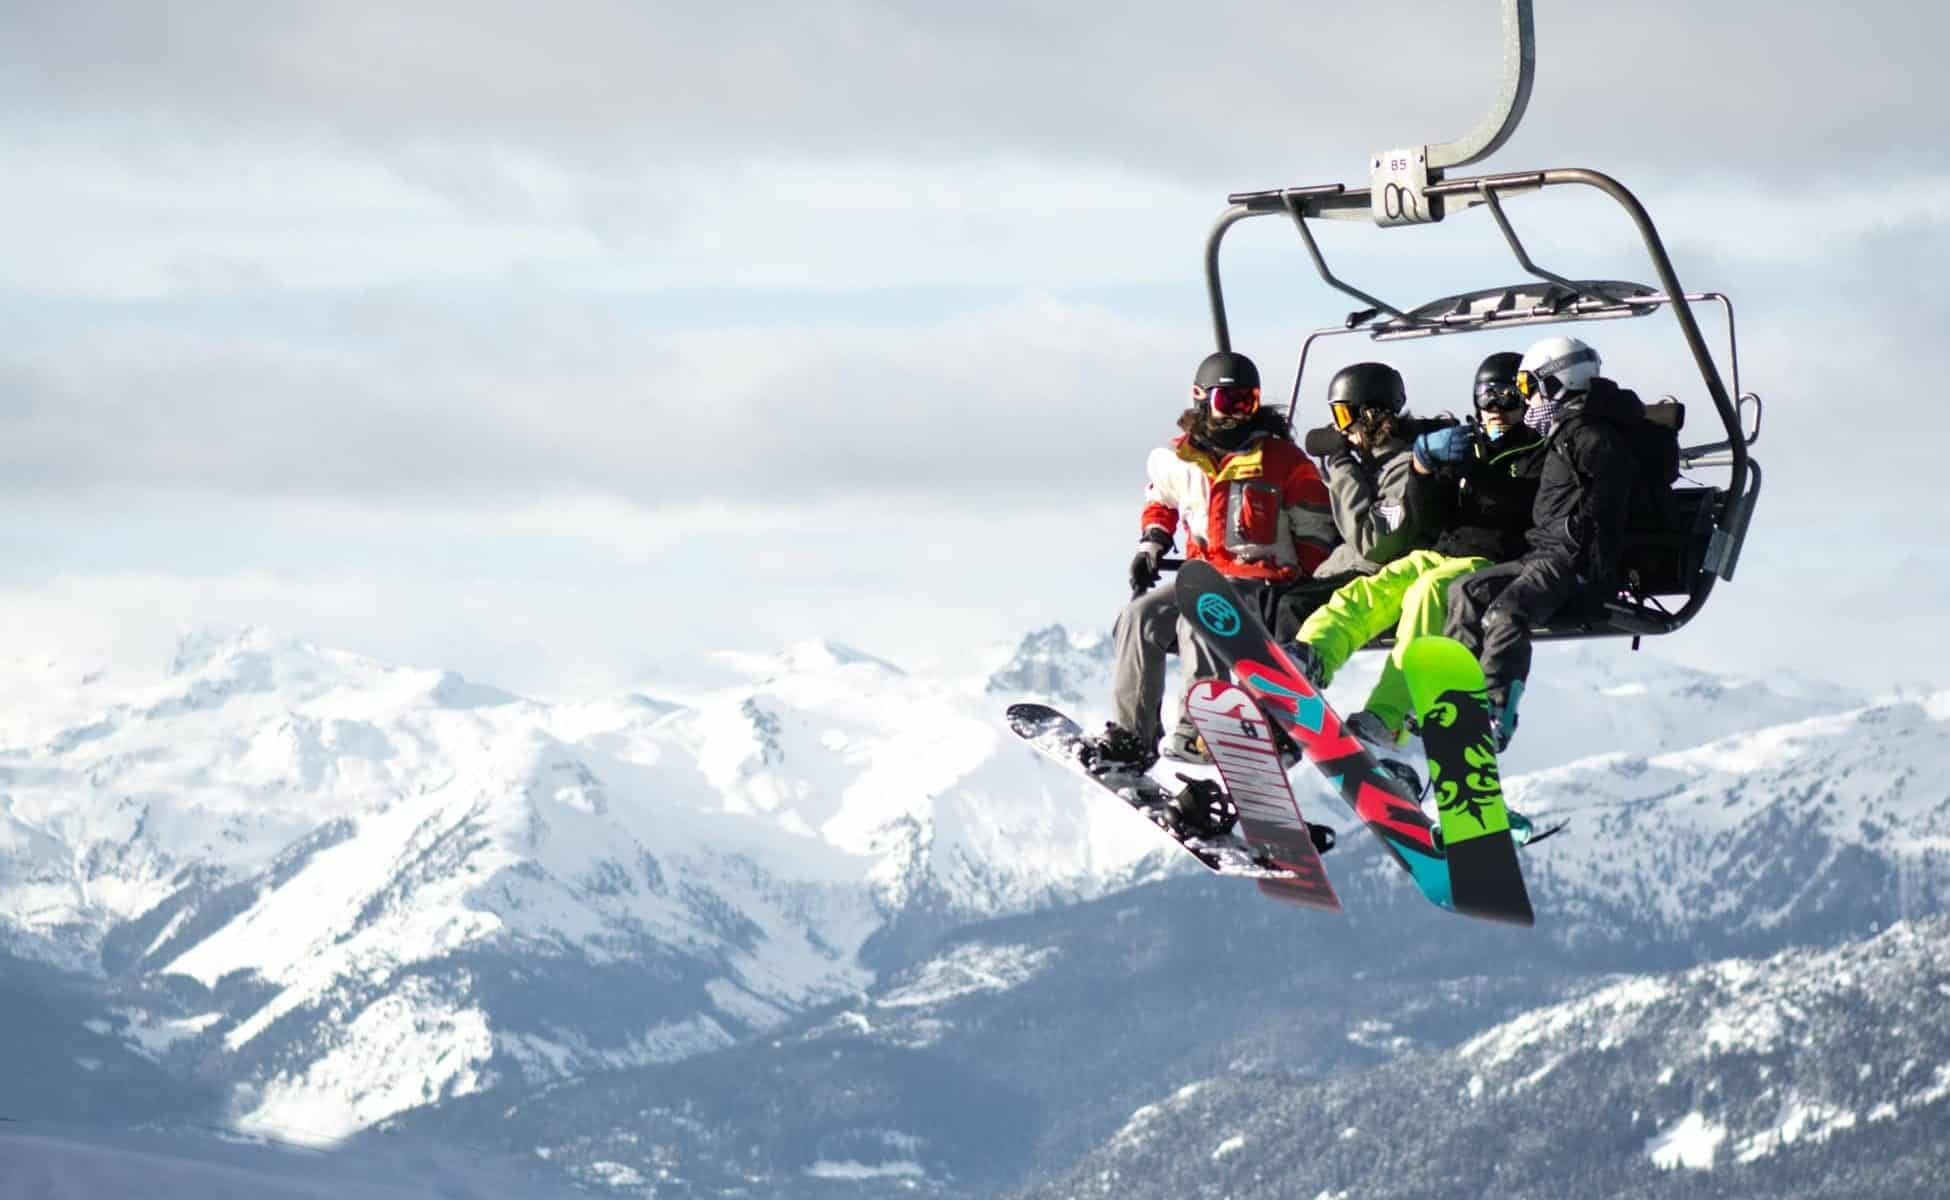 Visual of a Ski Resort